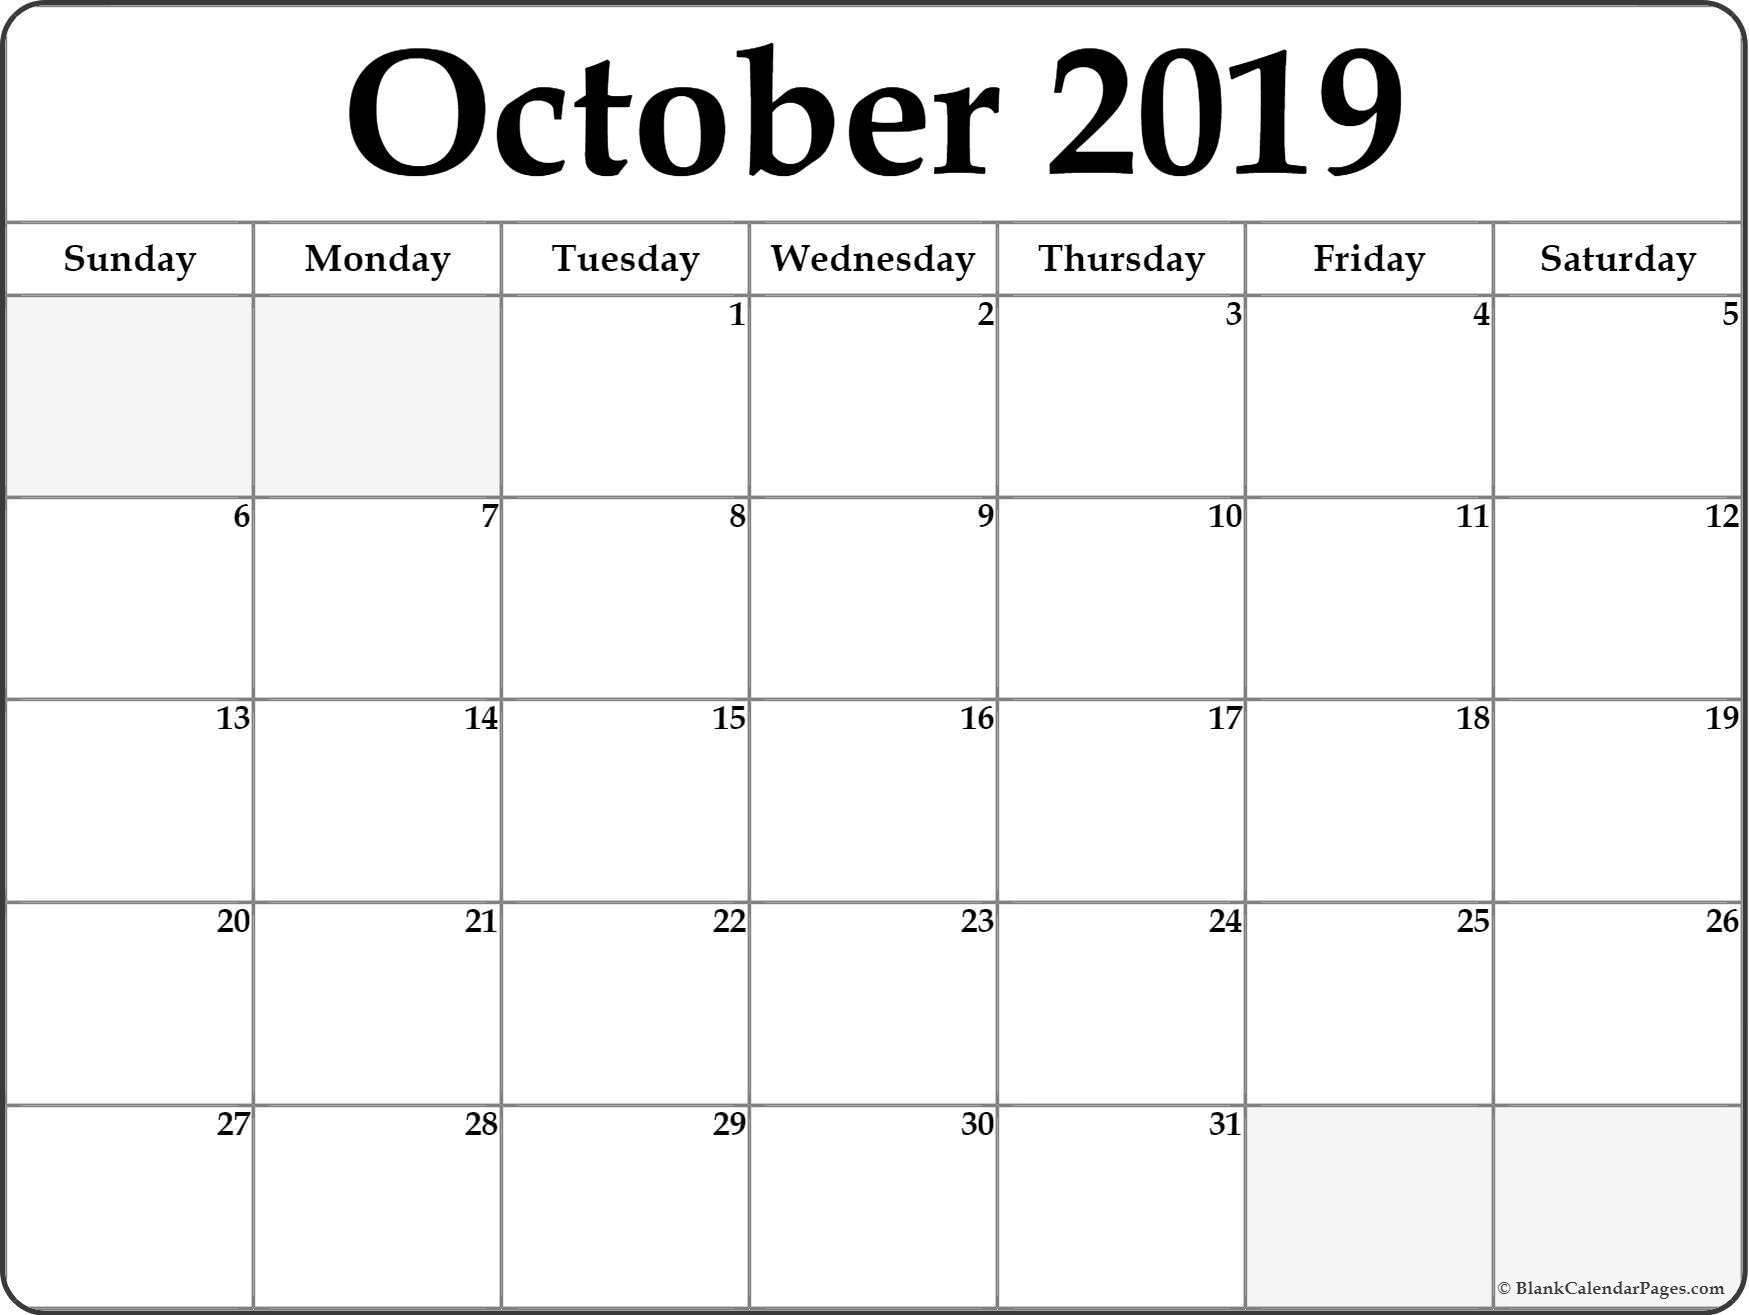 October Calendar 2019 Template